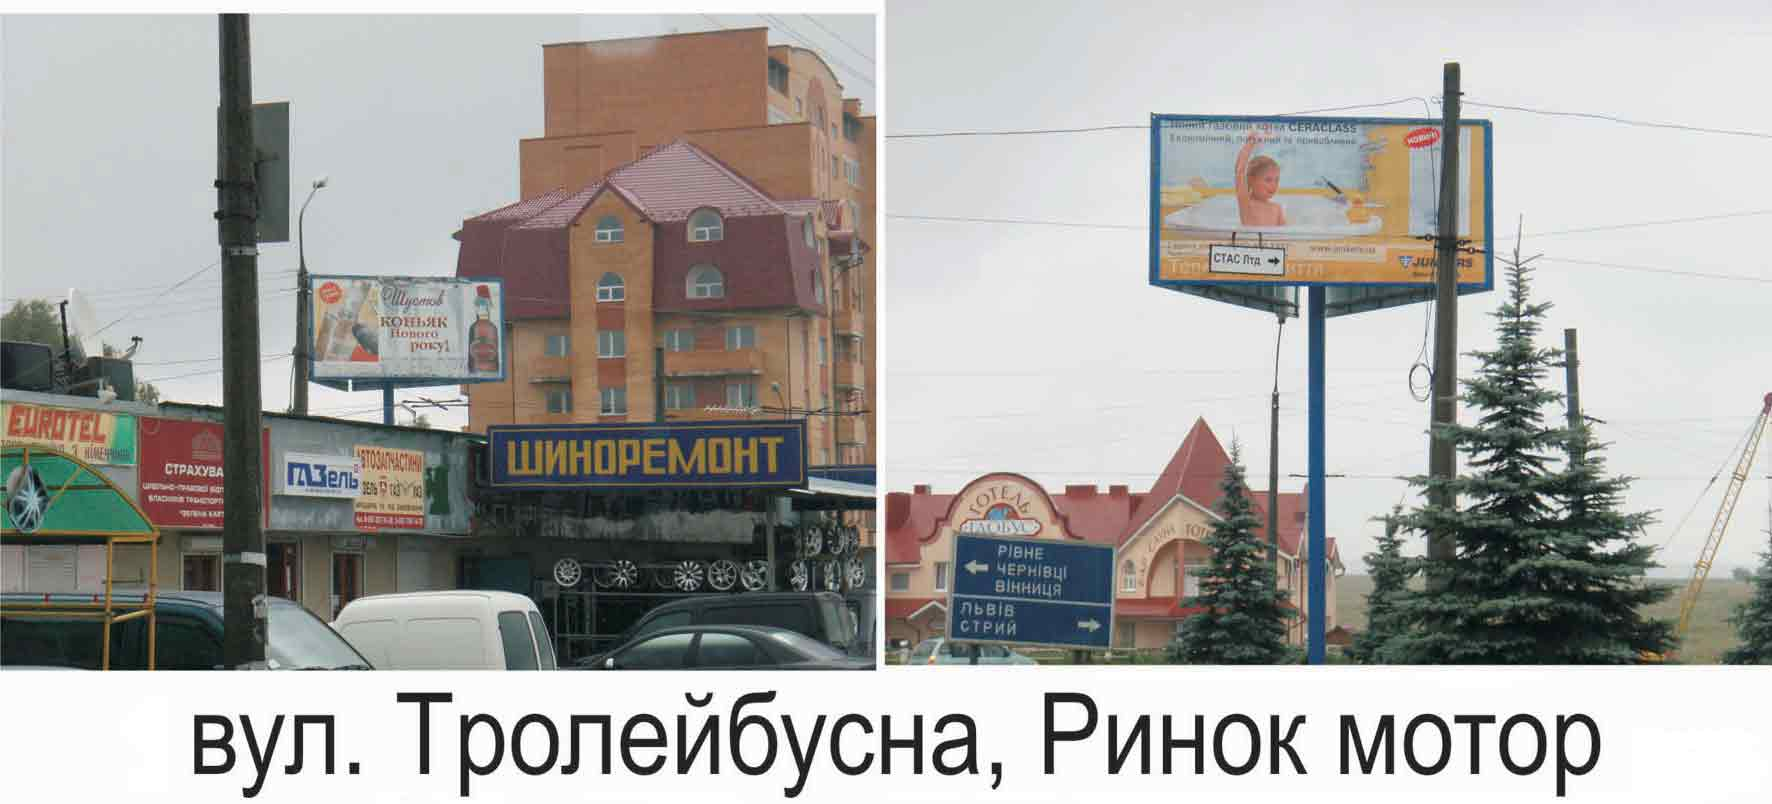 Вулиця Тролейбусна (ринок Мотор)